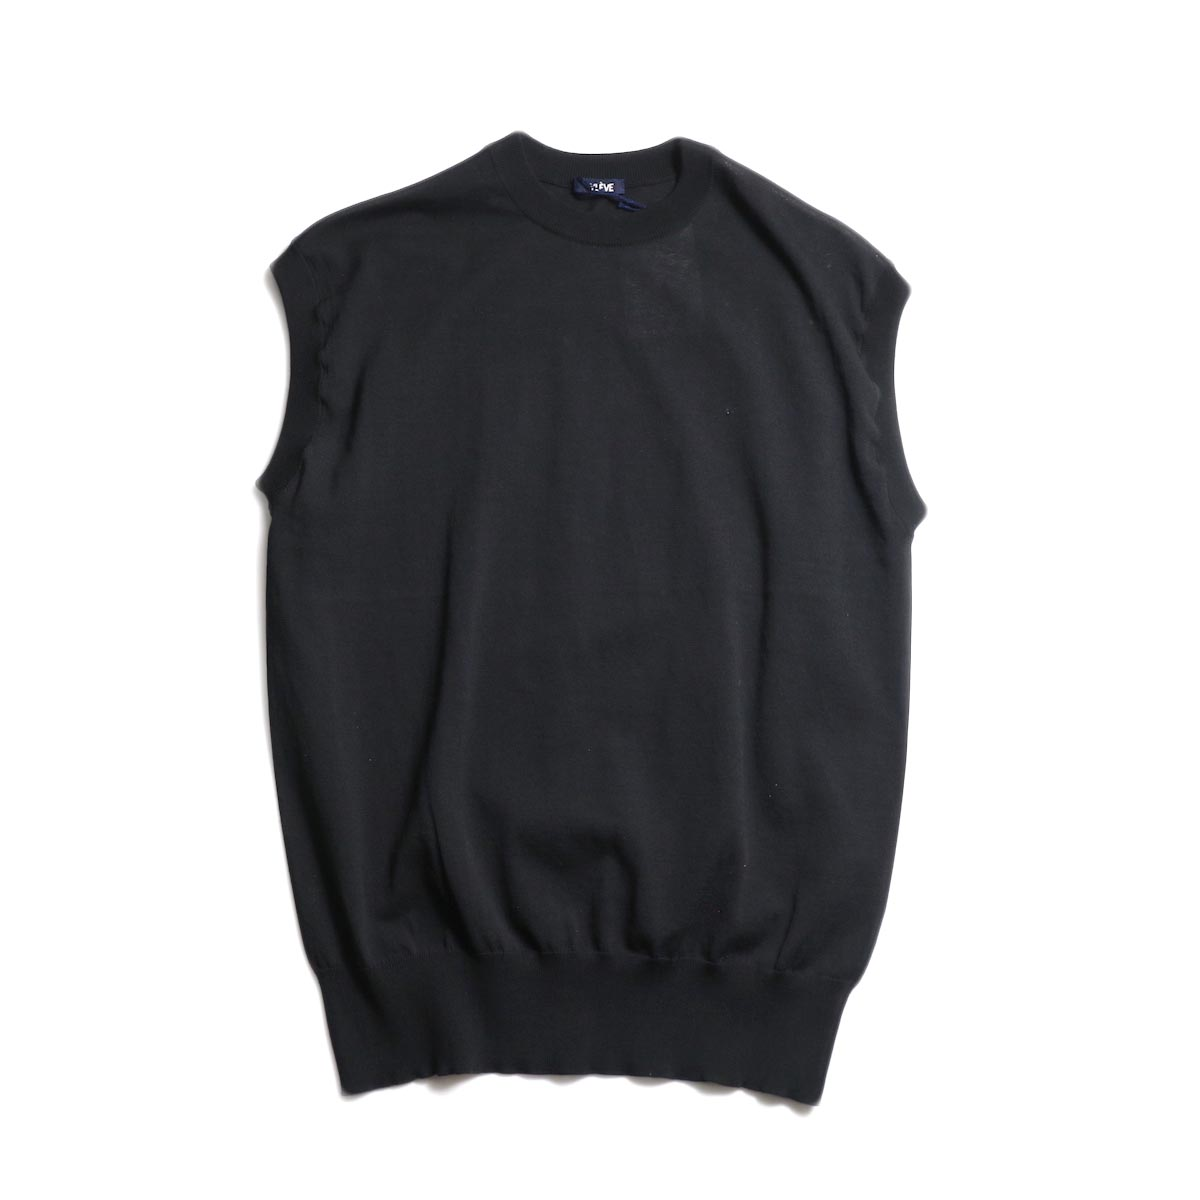 YLEVE / FINE COTTON KN N/S (Black)